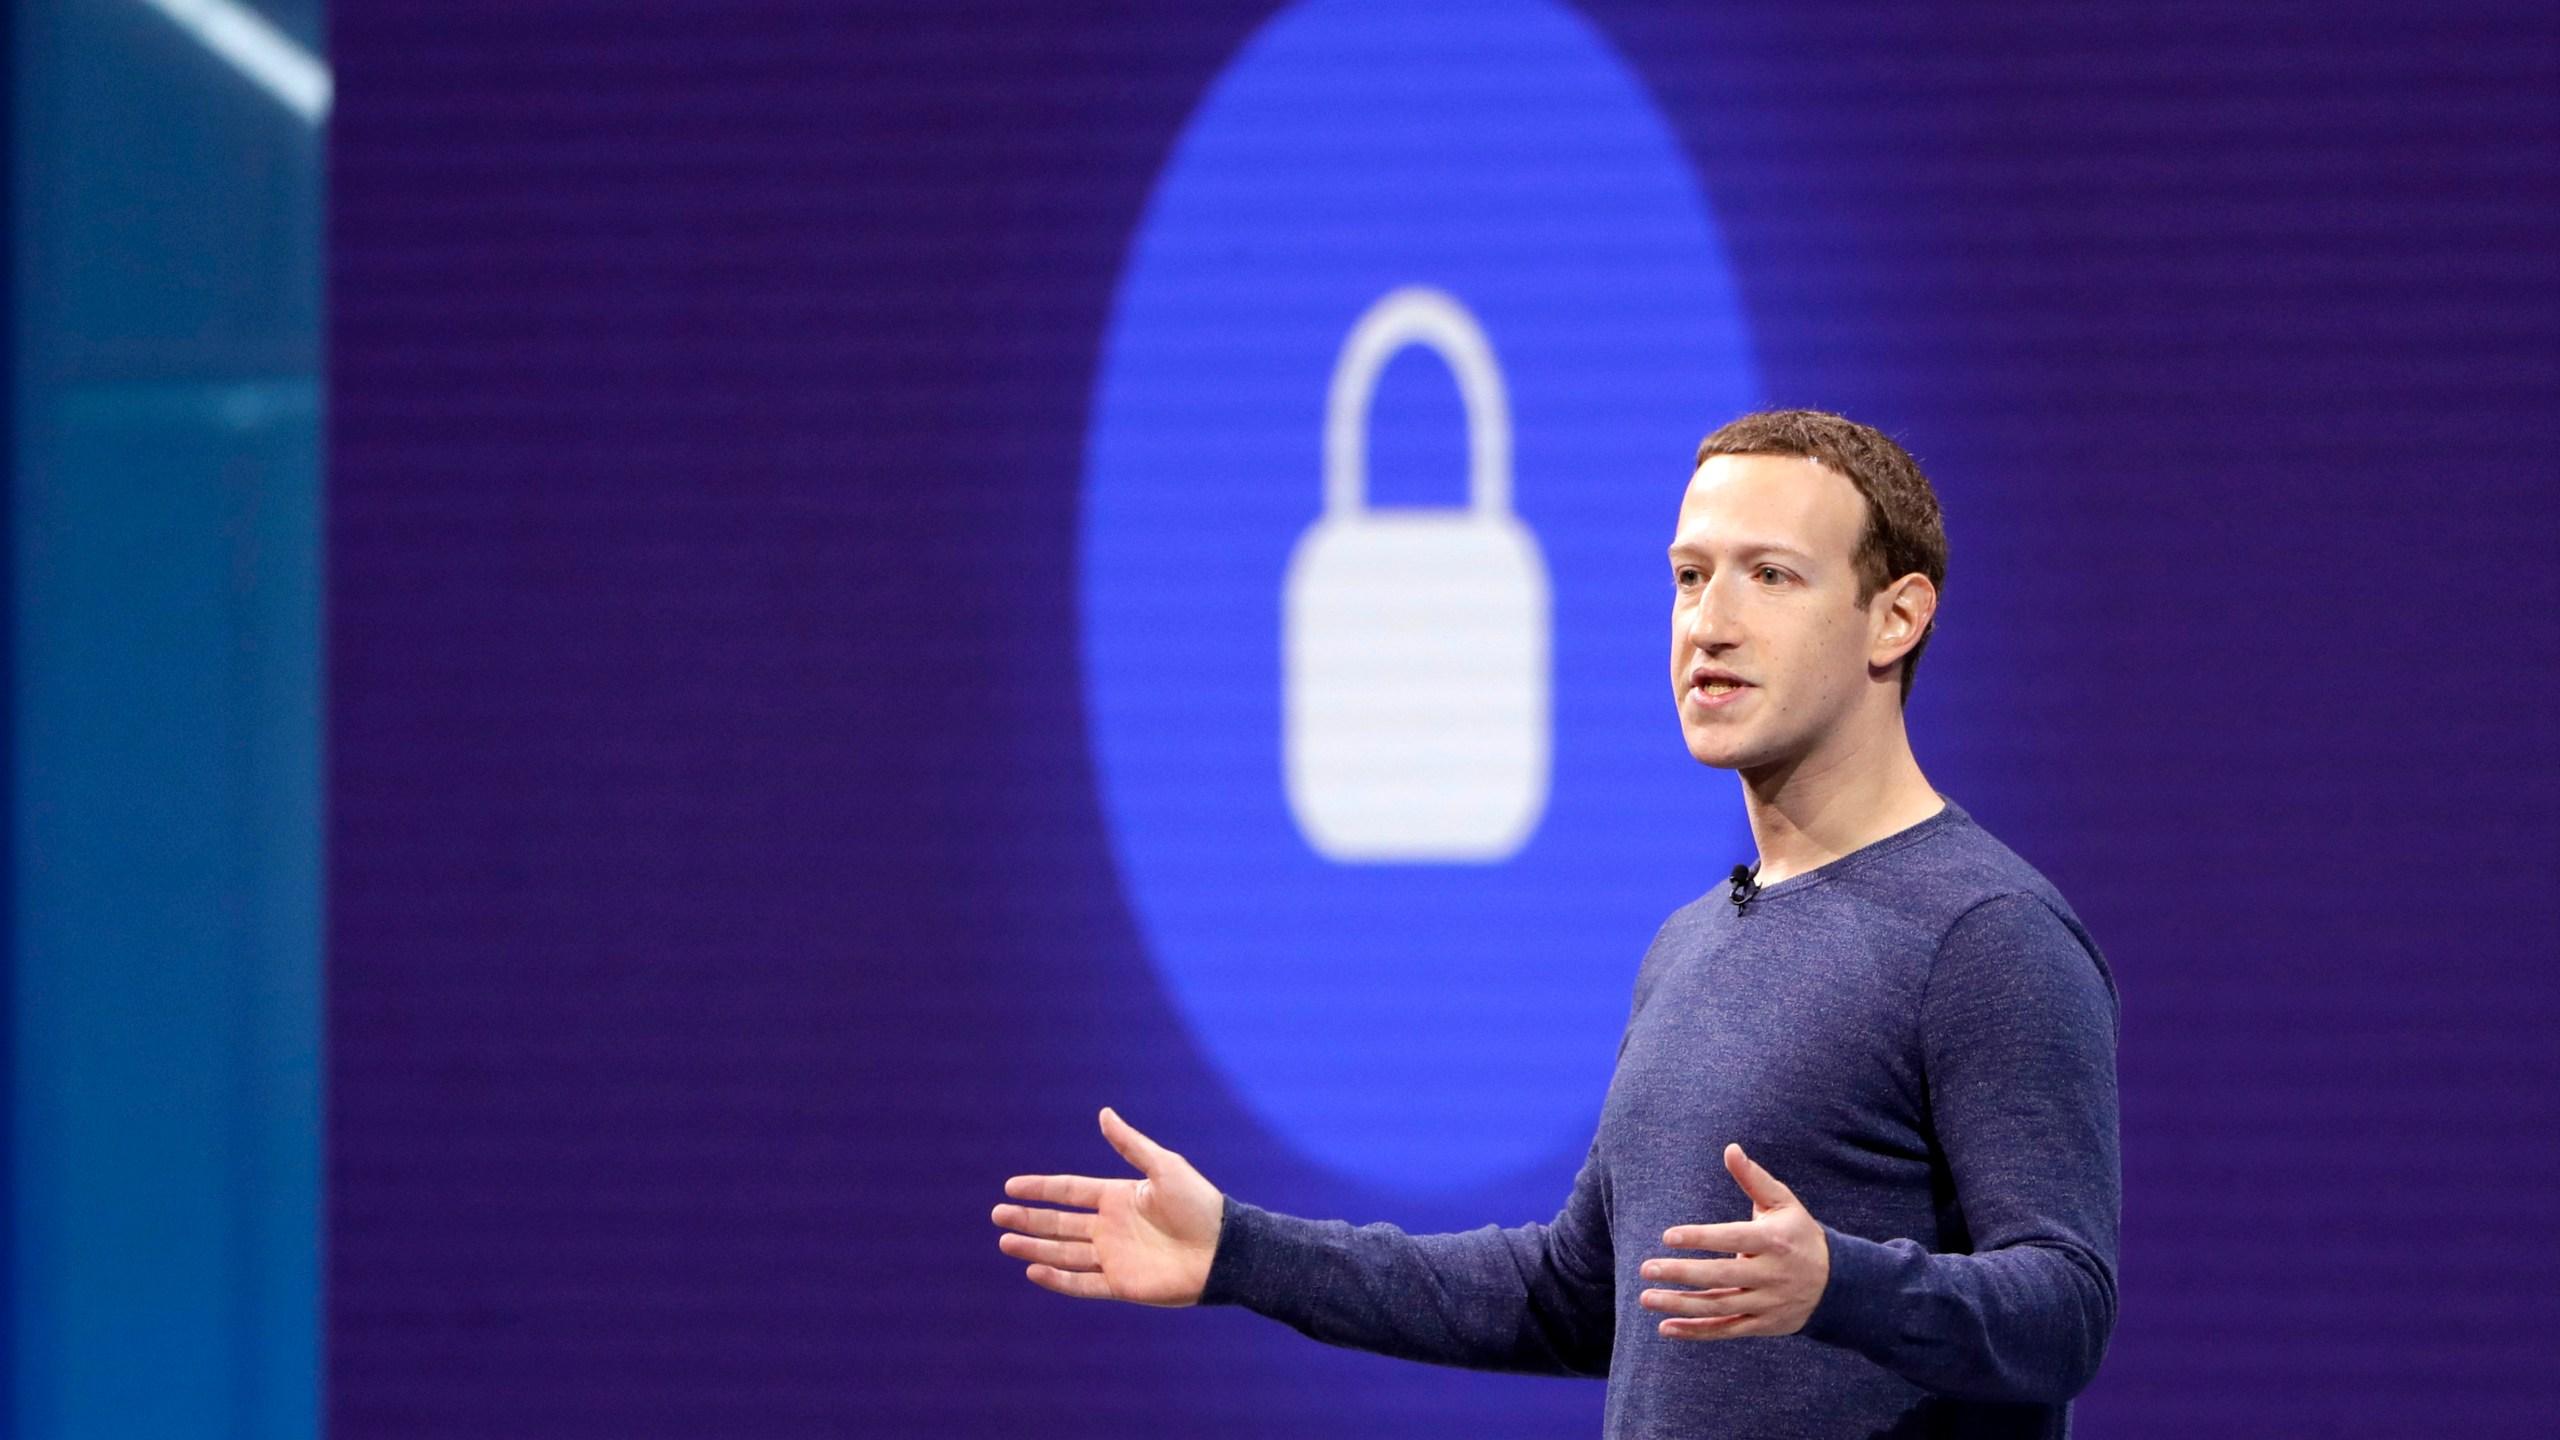 Facebook_Privacy_Vision_85279-159532.jpg55948961